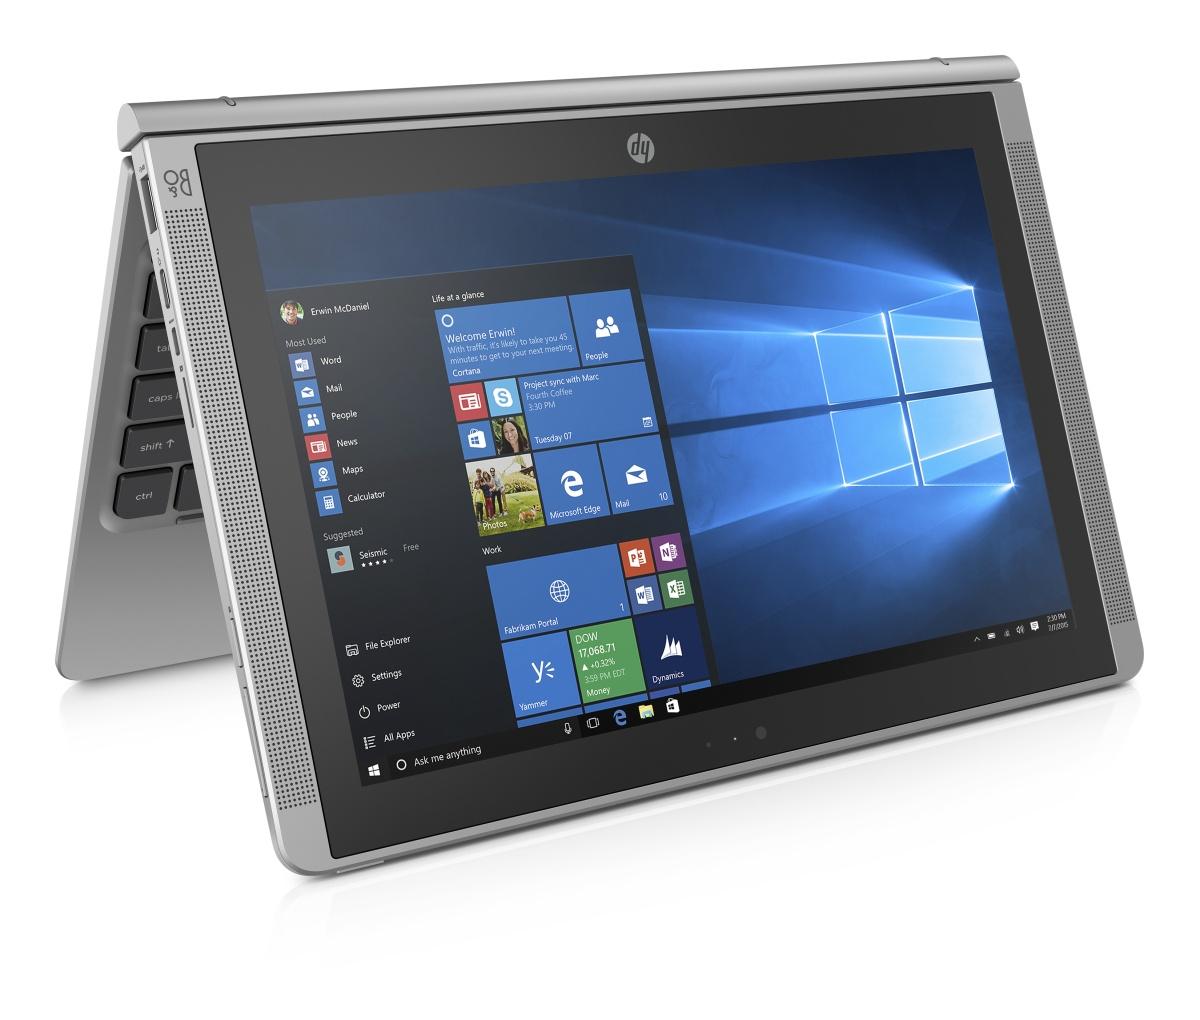 HP Pro x2 210 G1 10.1